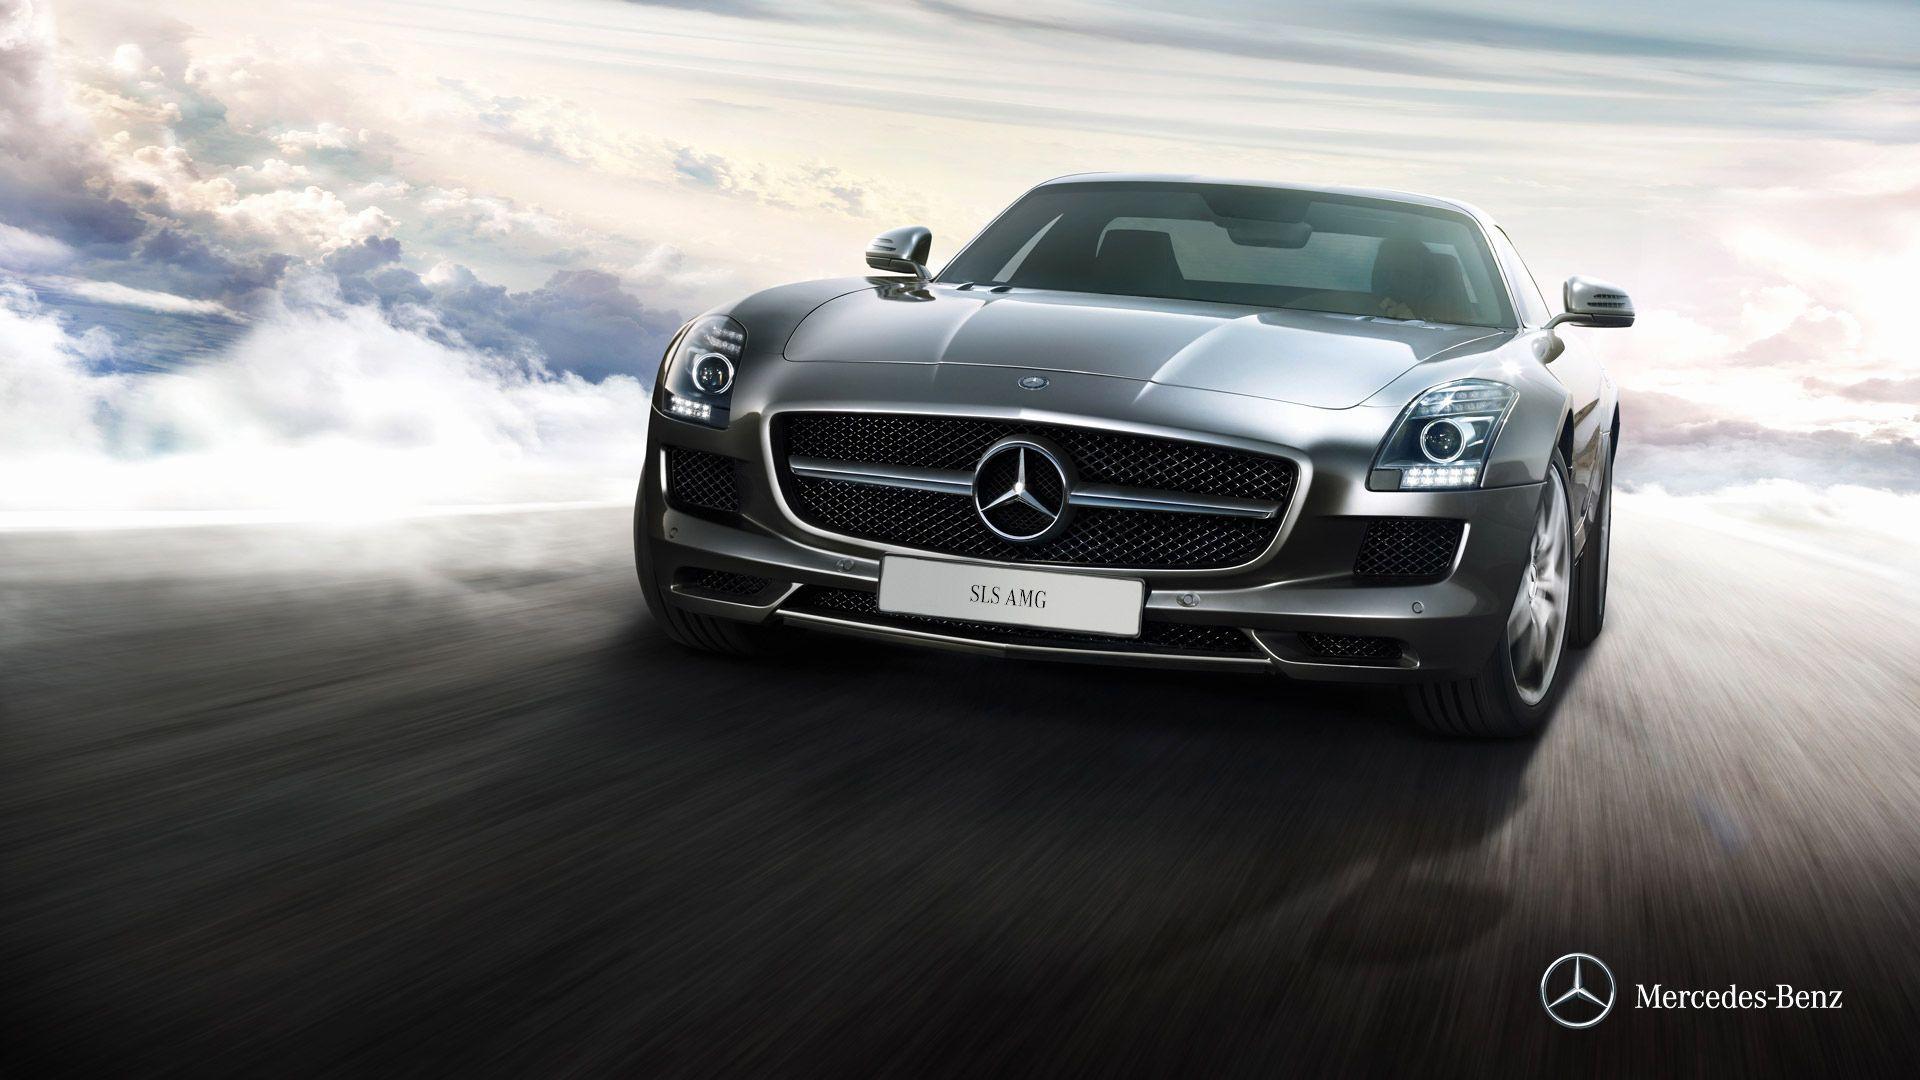 Mercedes Benz Car Hd Wallpapers Top Free Mercedes Benz Car From